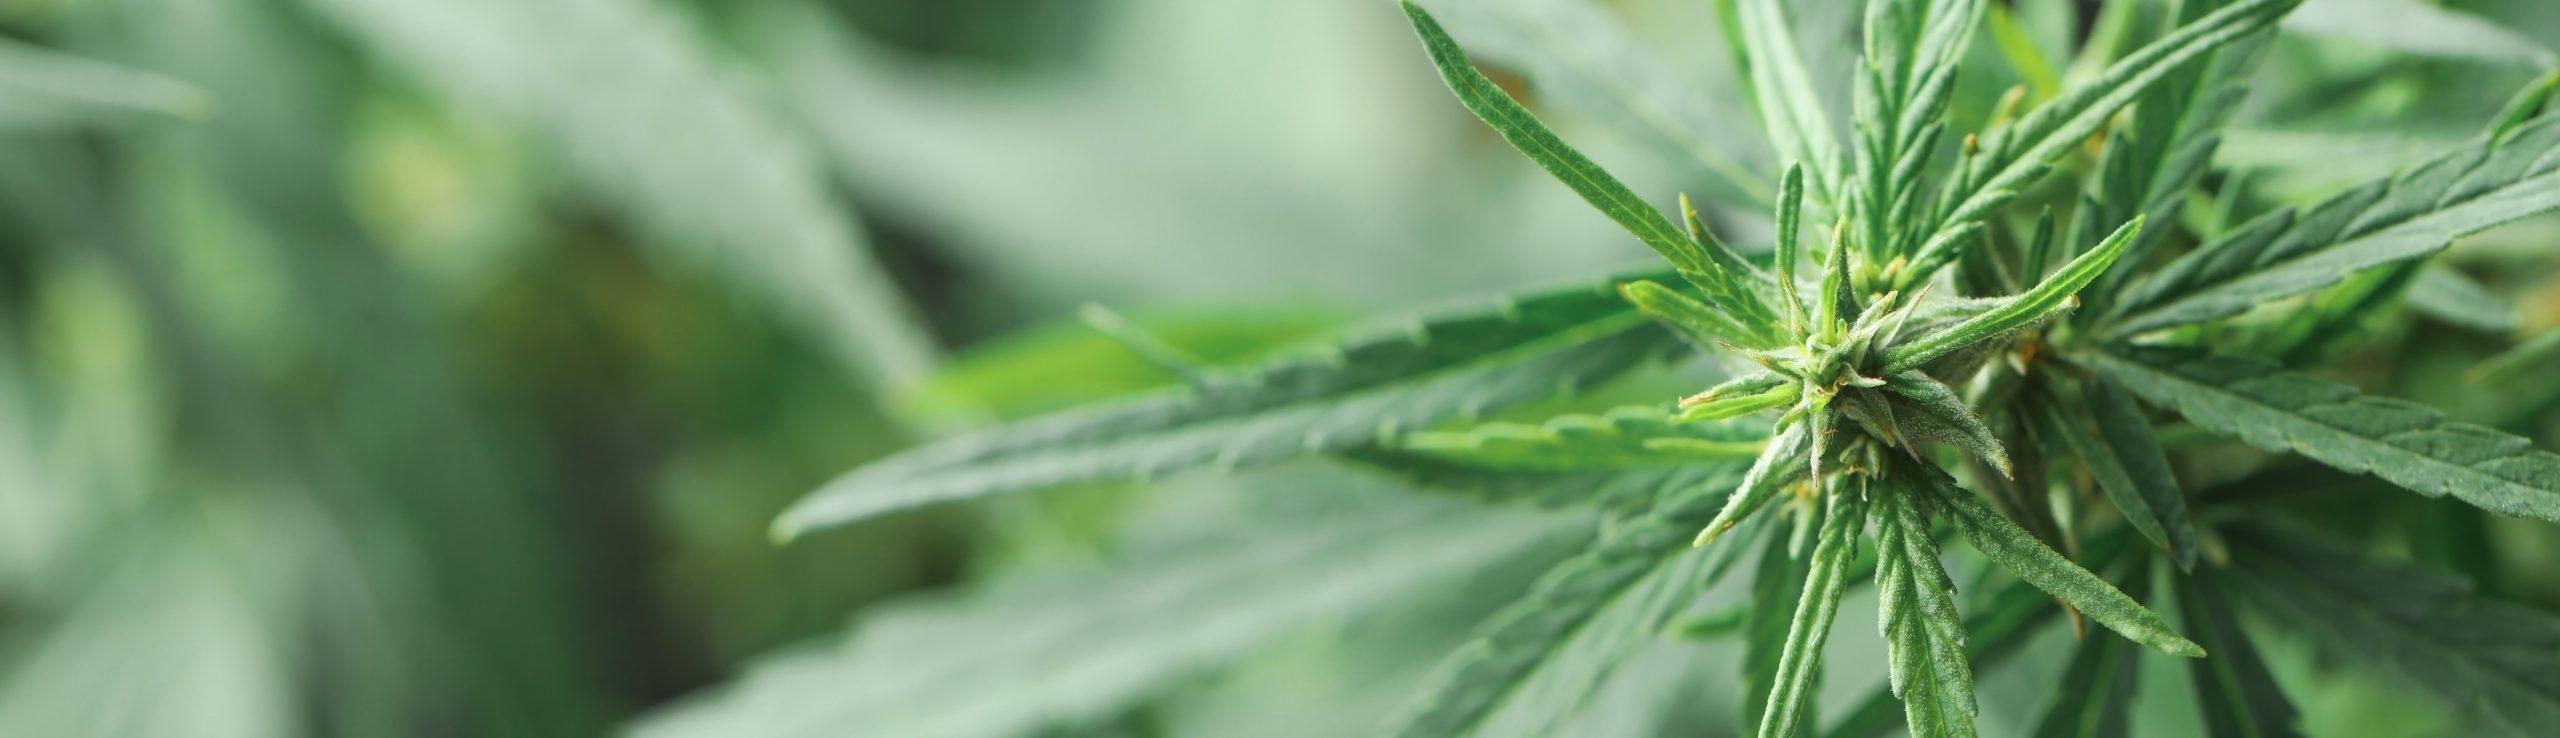 Medical Mariijuana